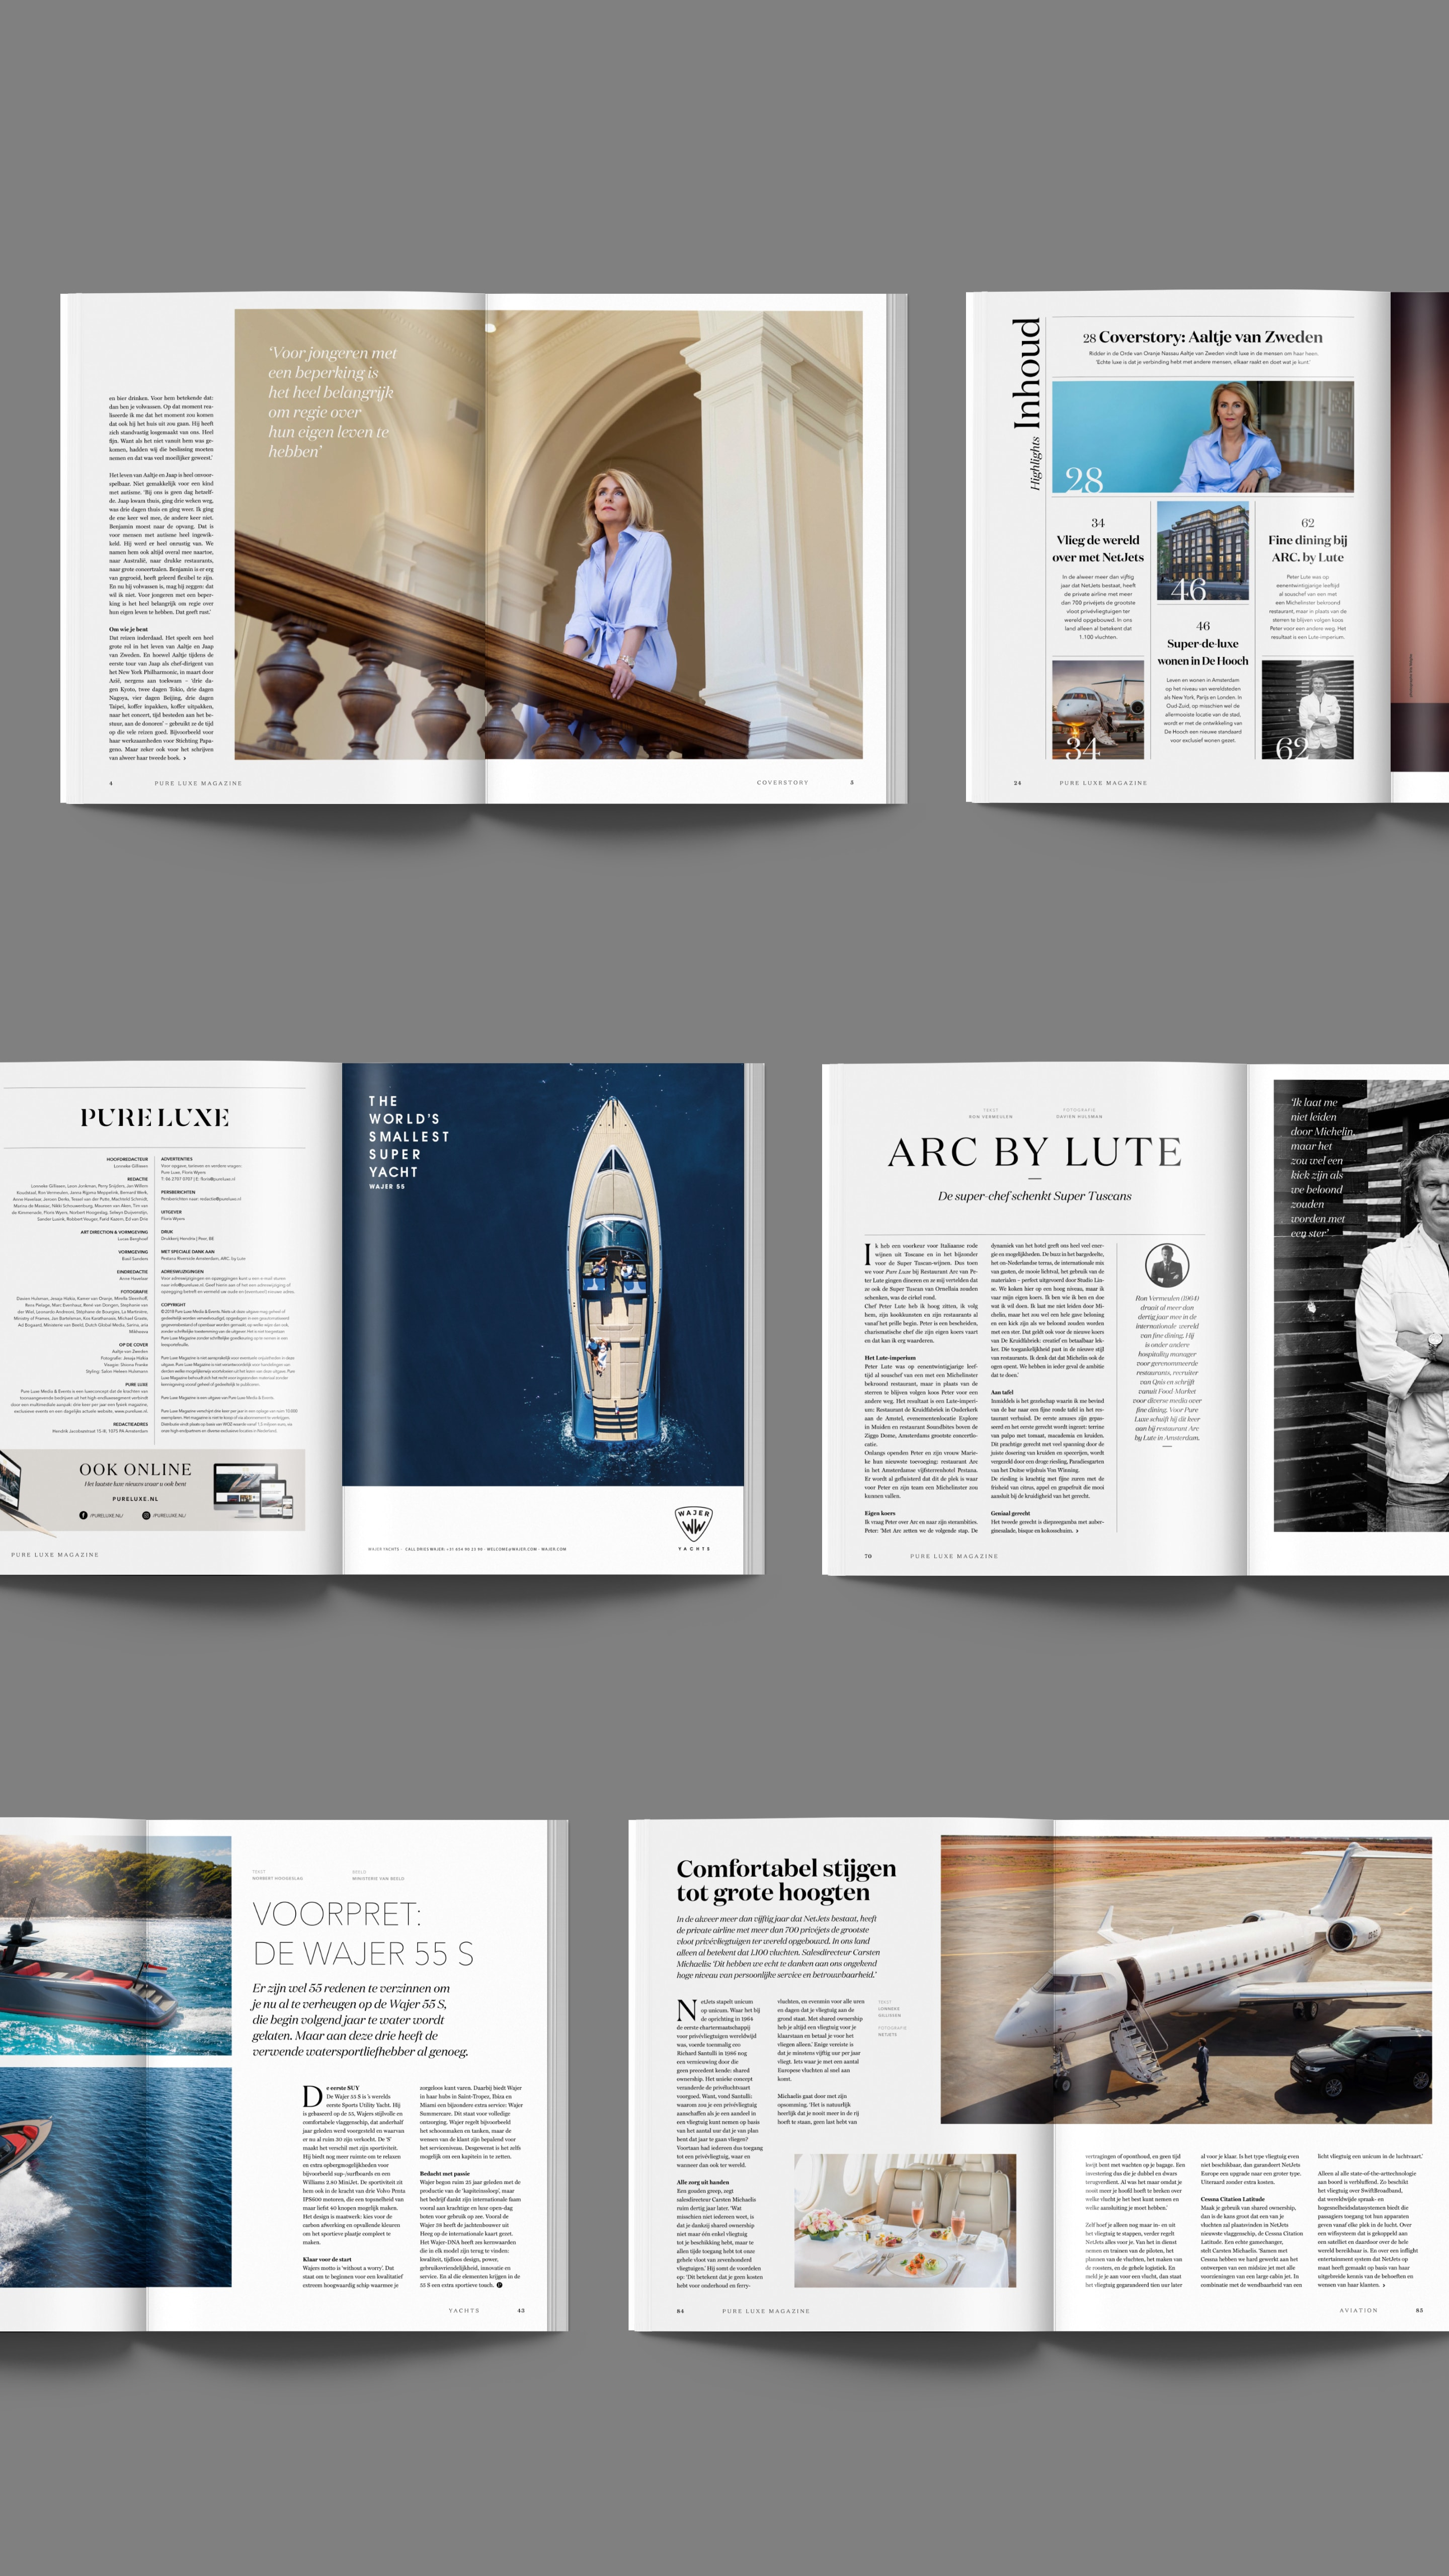 PL-Print-Magazine-12-3